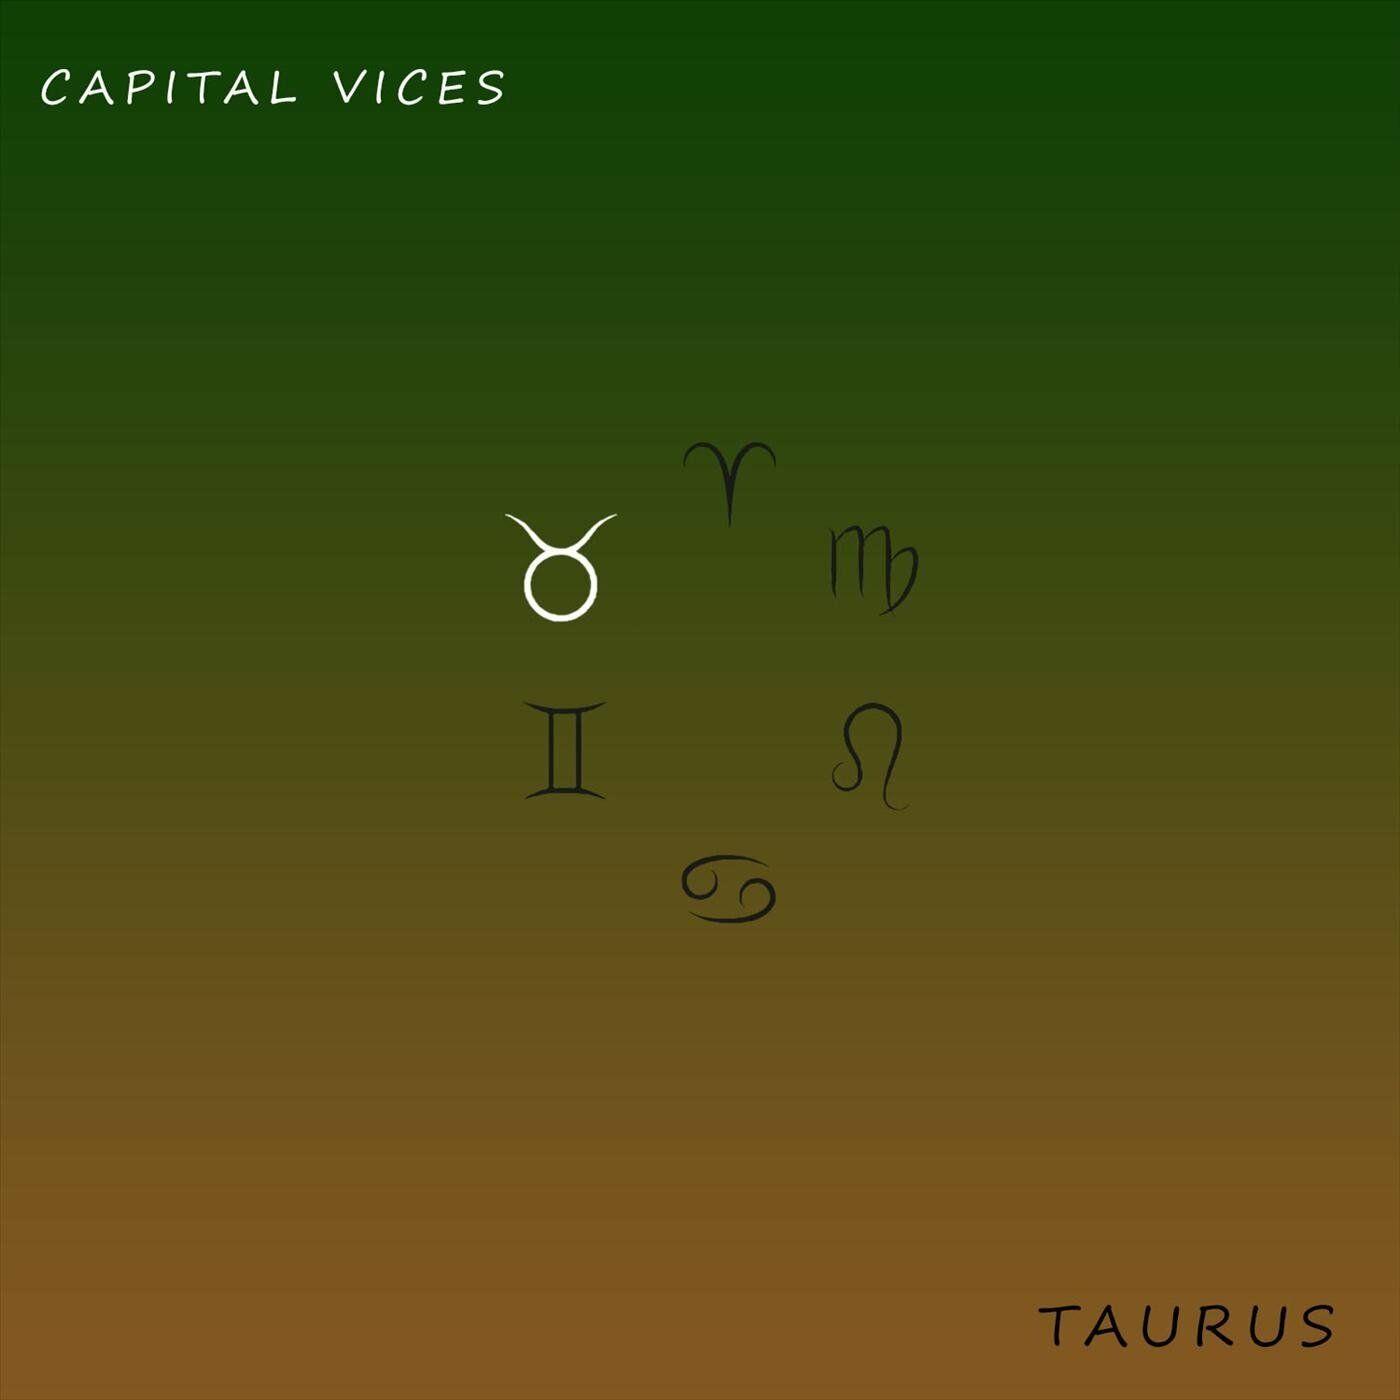 Capital Vices - Taurus [single] (2020)